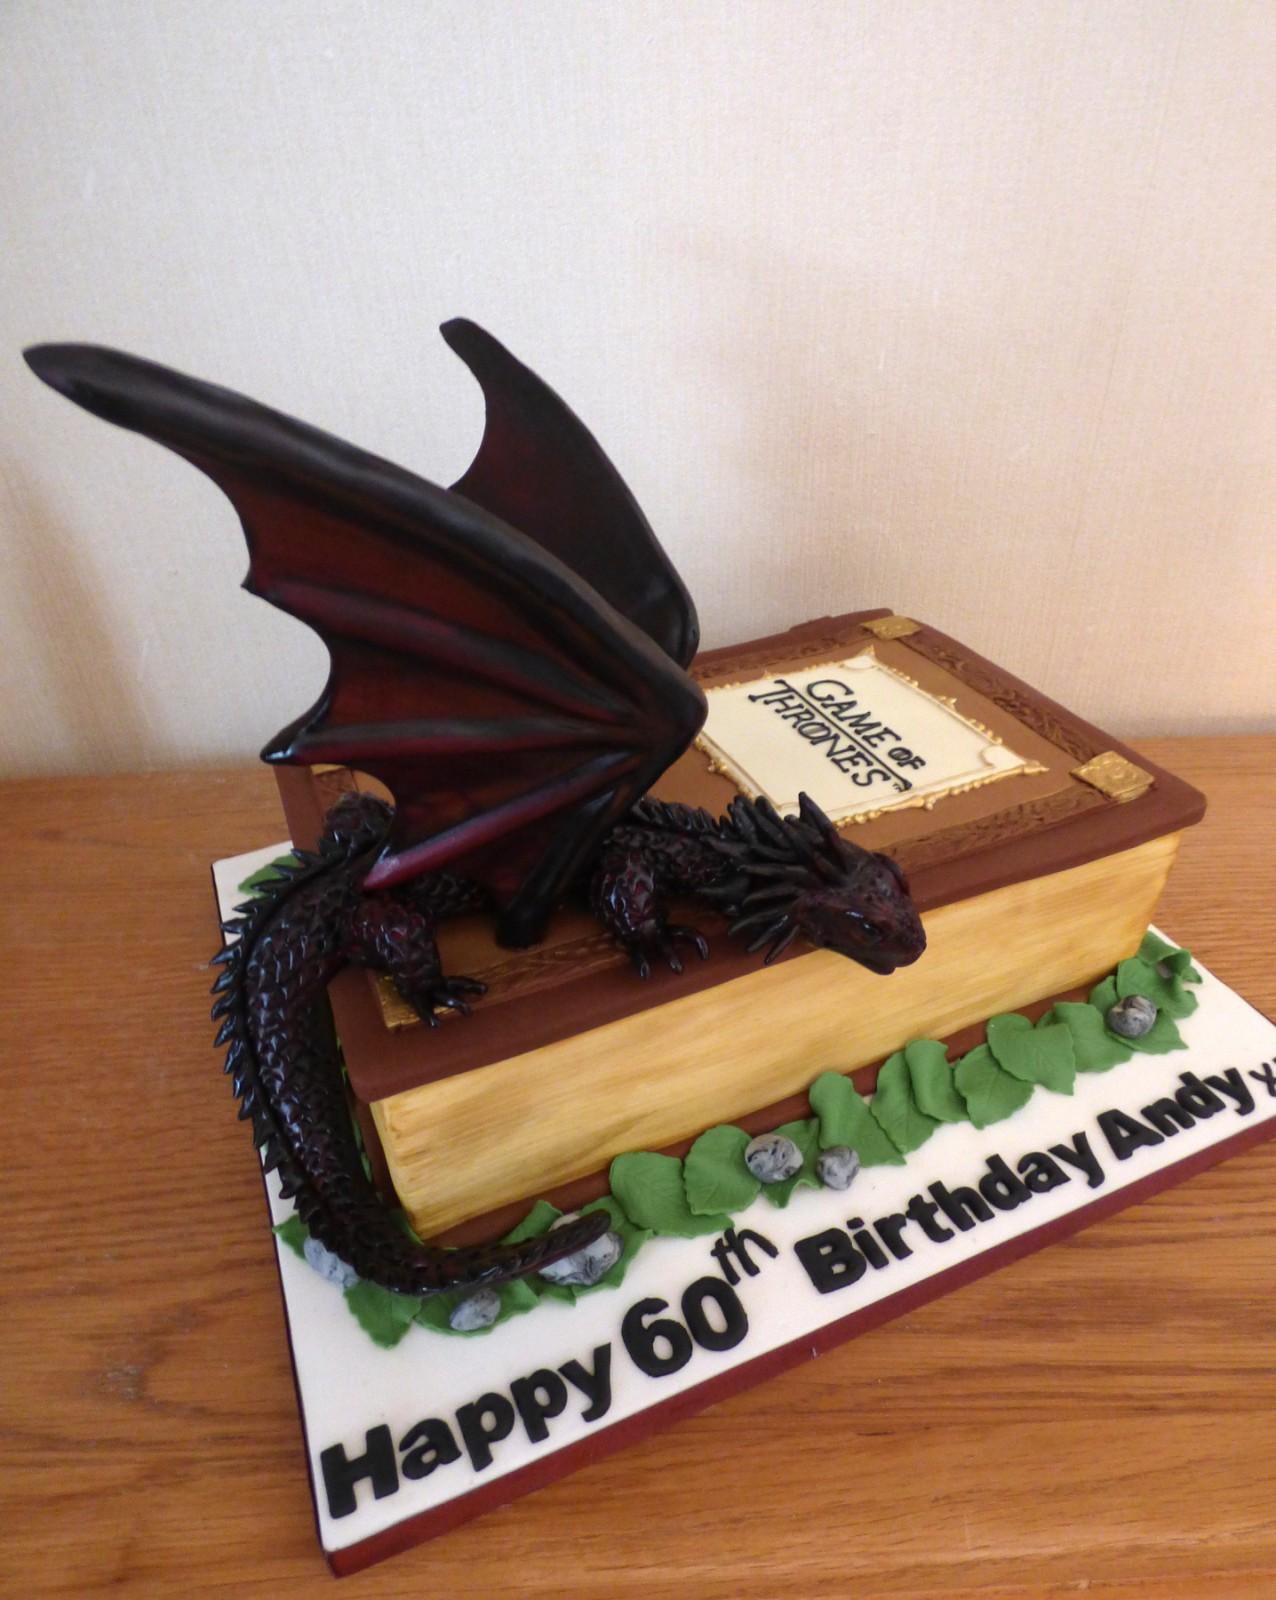 Stupendous Game Of Thrones Book With Dragon Birthday Cake Susies Cakes Personalised Birthday Cards Veneteletsinfo